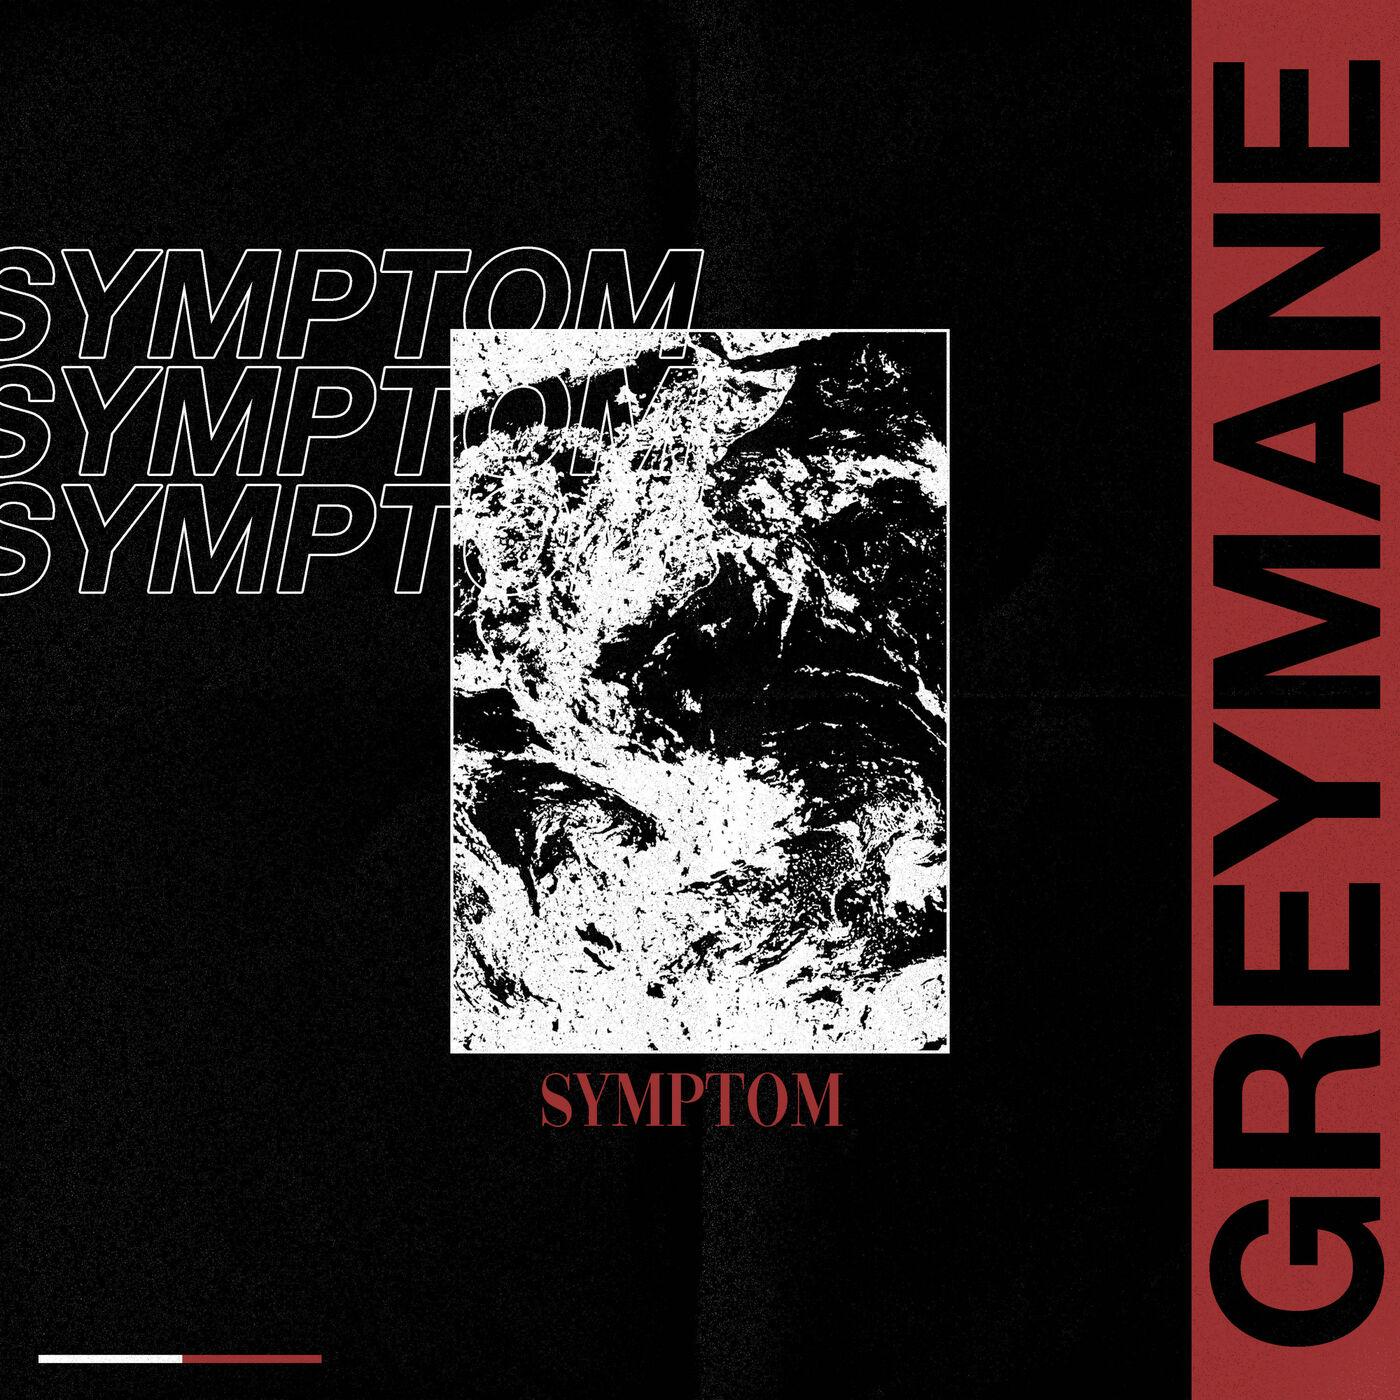 Greymane - Symptom [single] (2020)